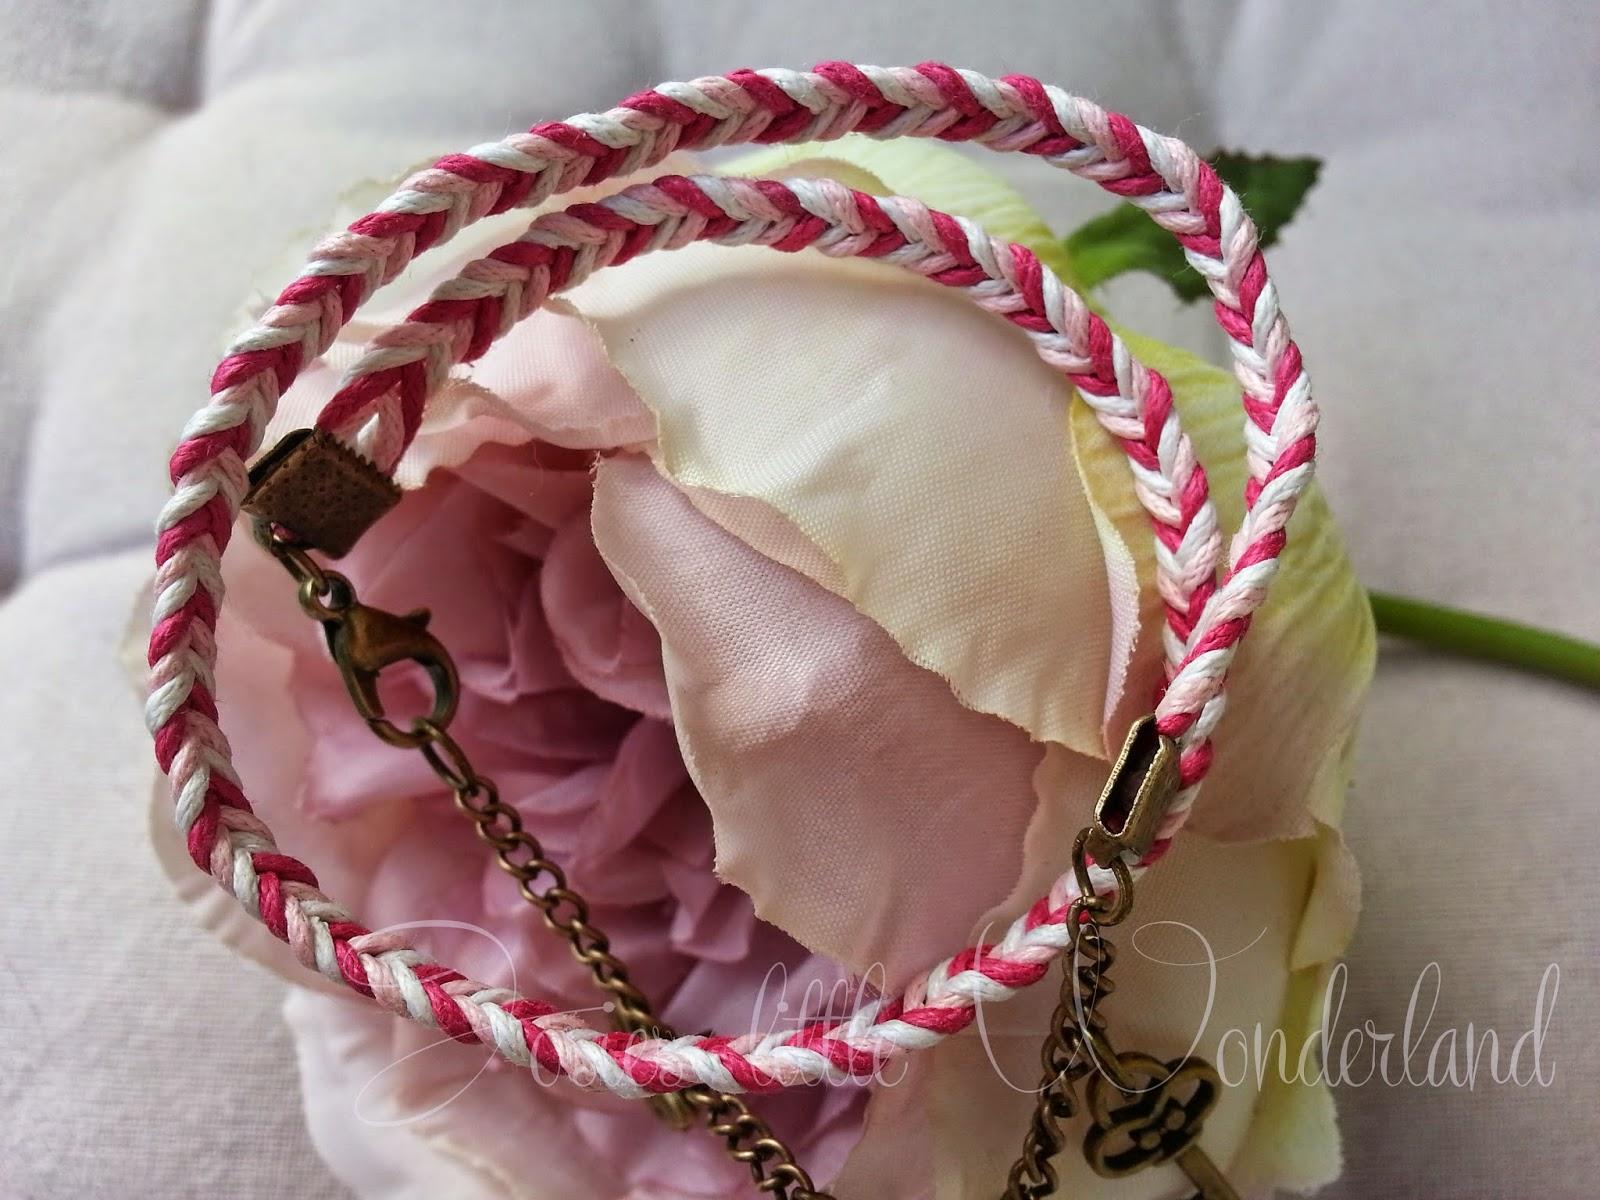 Bastelstunde | Geflochtenes Armband mit Charms - www.josieslittlewonderland.de . diy, bastelstunde, handmade, armband selber flechten im Fischgrätmuster, Bettelarmand, Armband mit Charms diy